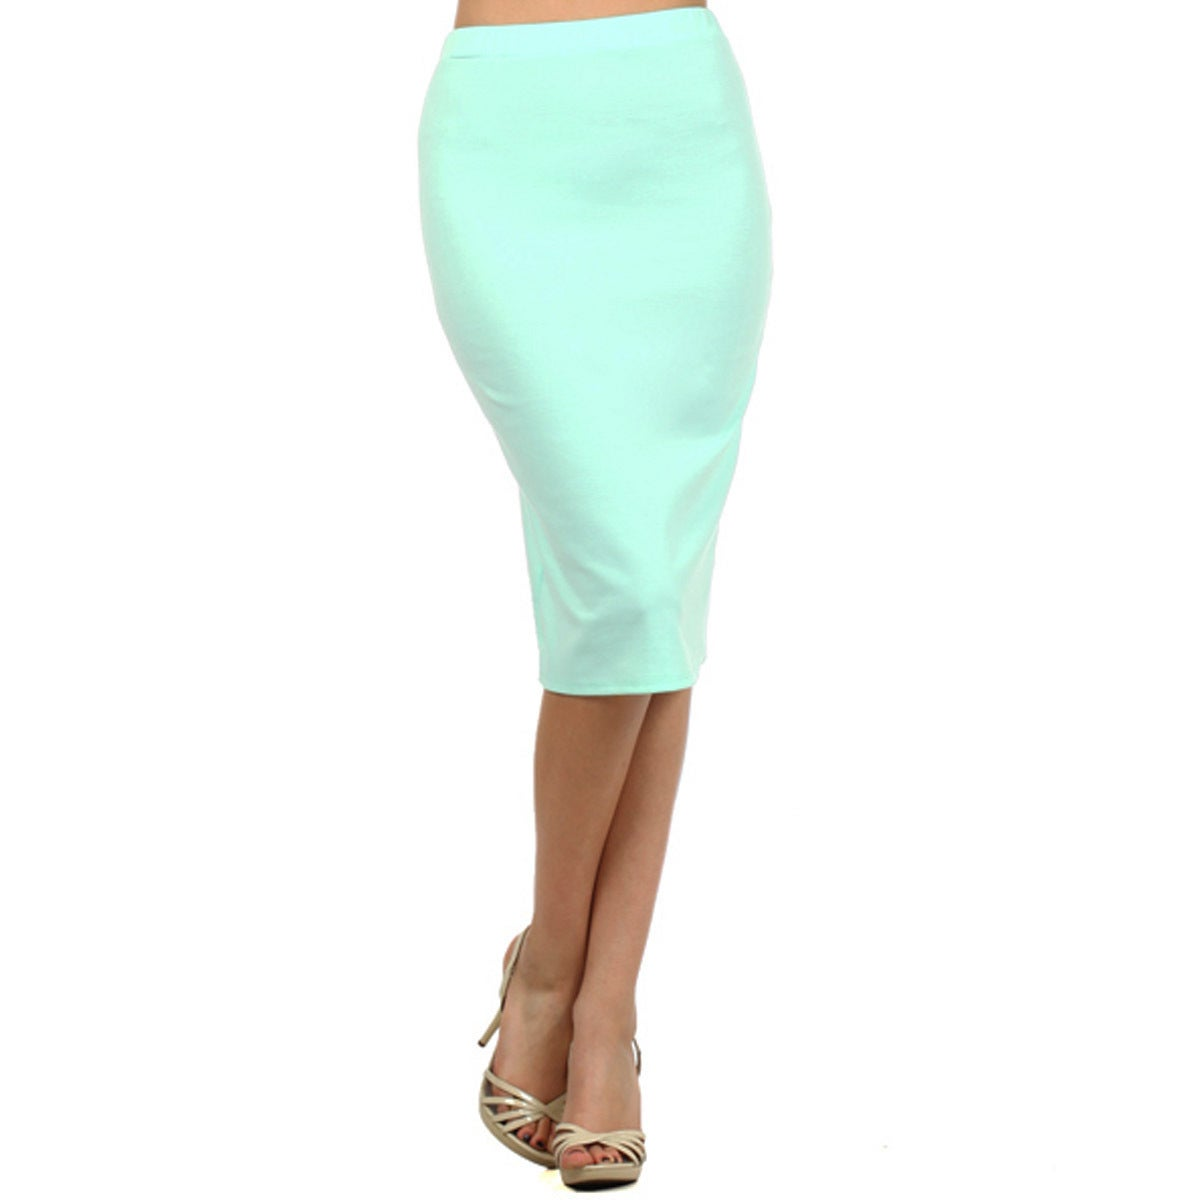 72acddafdf Shop MOA Collection Women's Plus Size High Waist Pencil Skirt - On ...